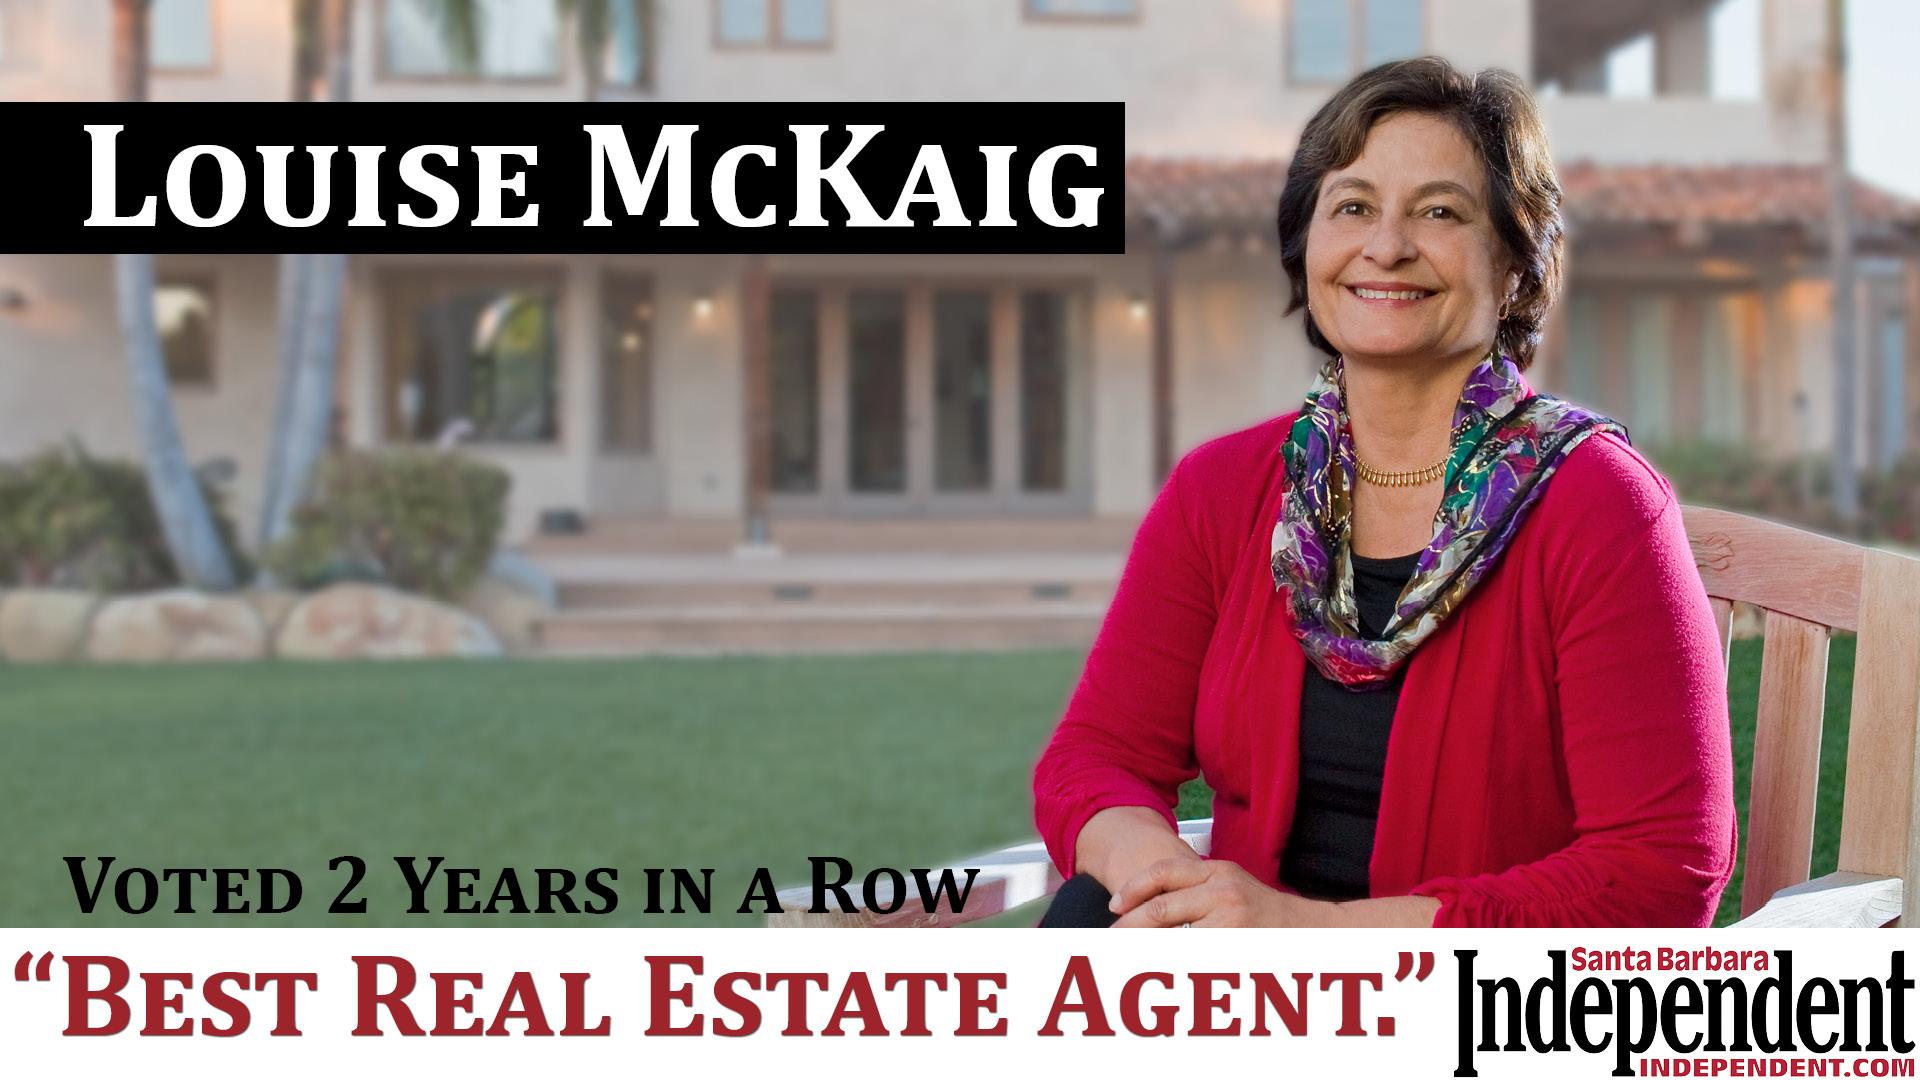 Best real estate agent, best real estate broker, best real estate company, Louise Mckaig, village properties